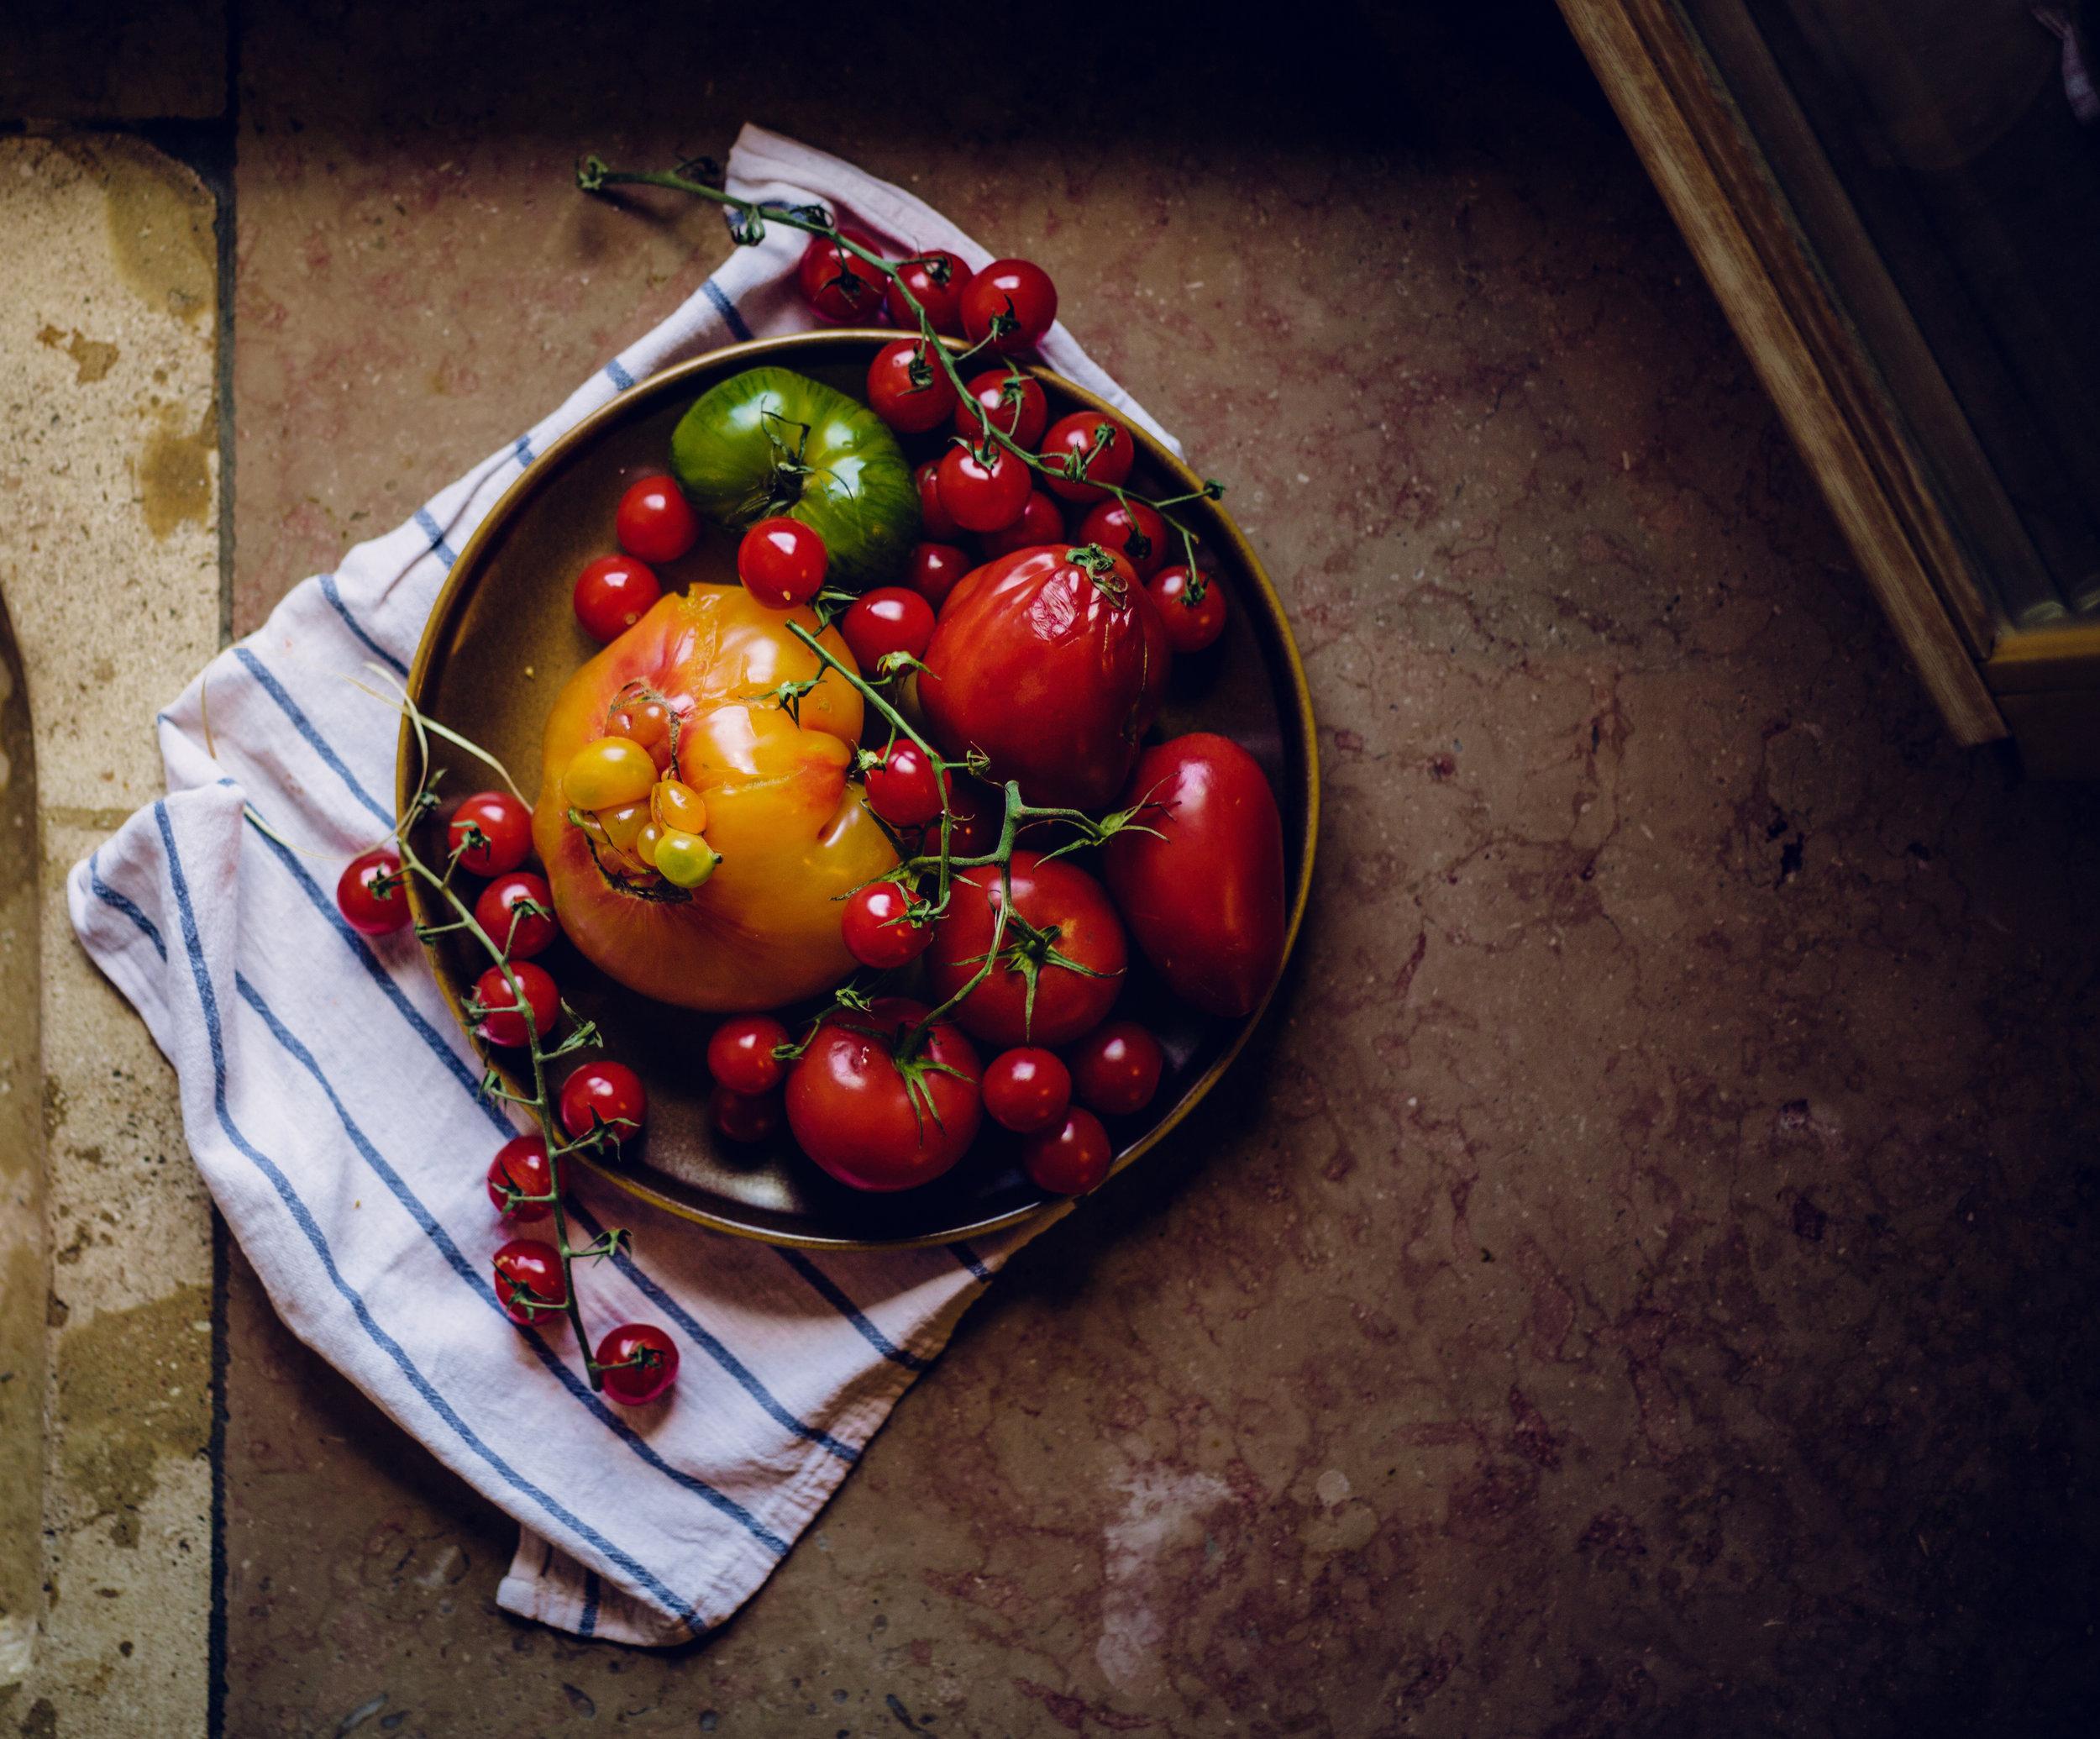 provence tomatoes on the windowsill.jpg